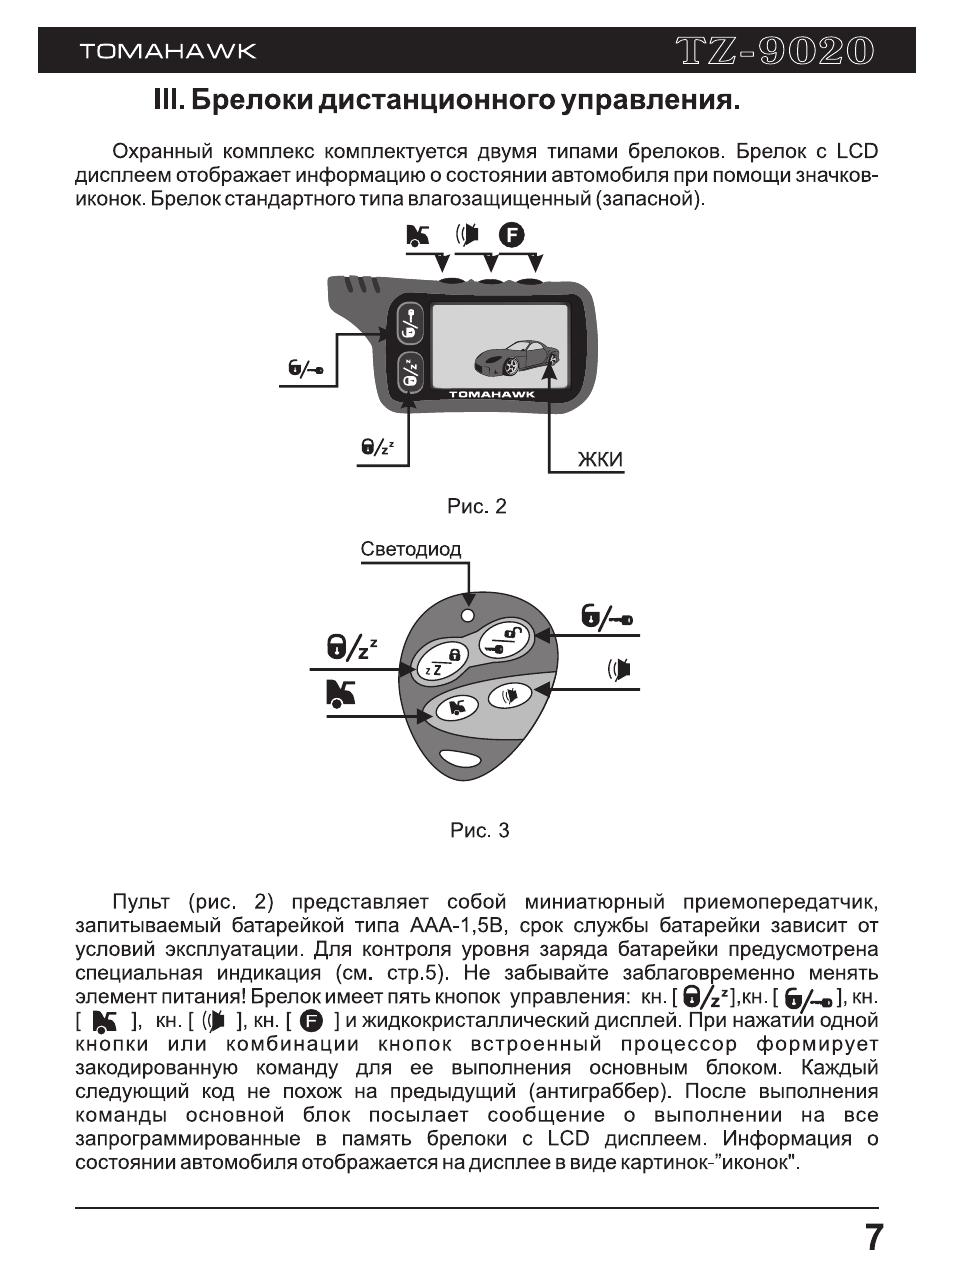 инструкция томагавк tz 9020 docme.ru